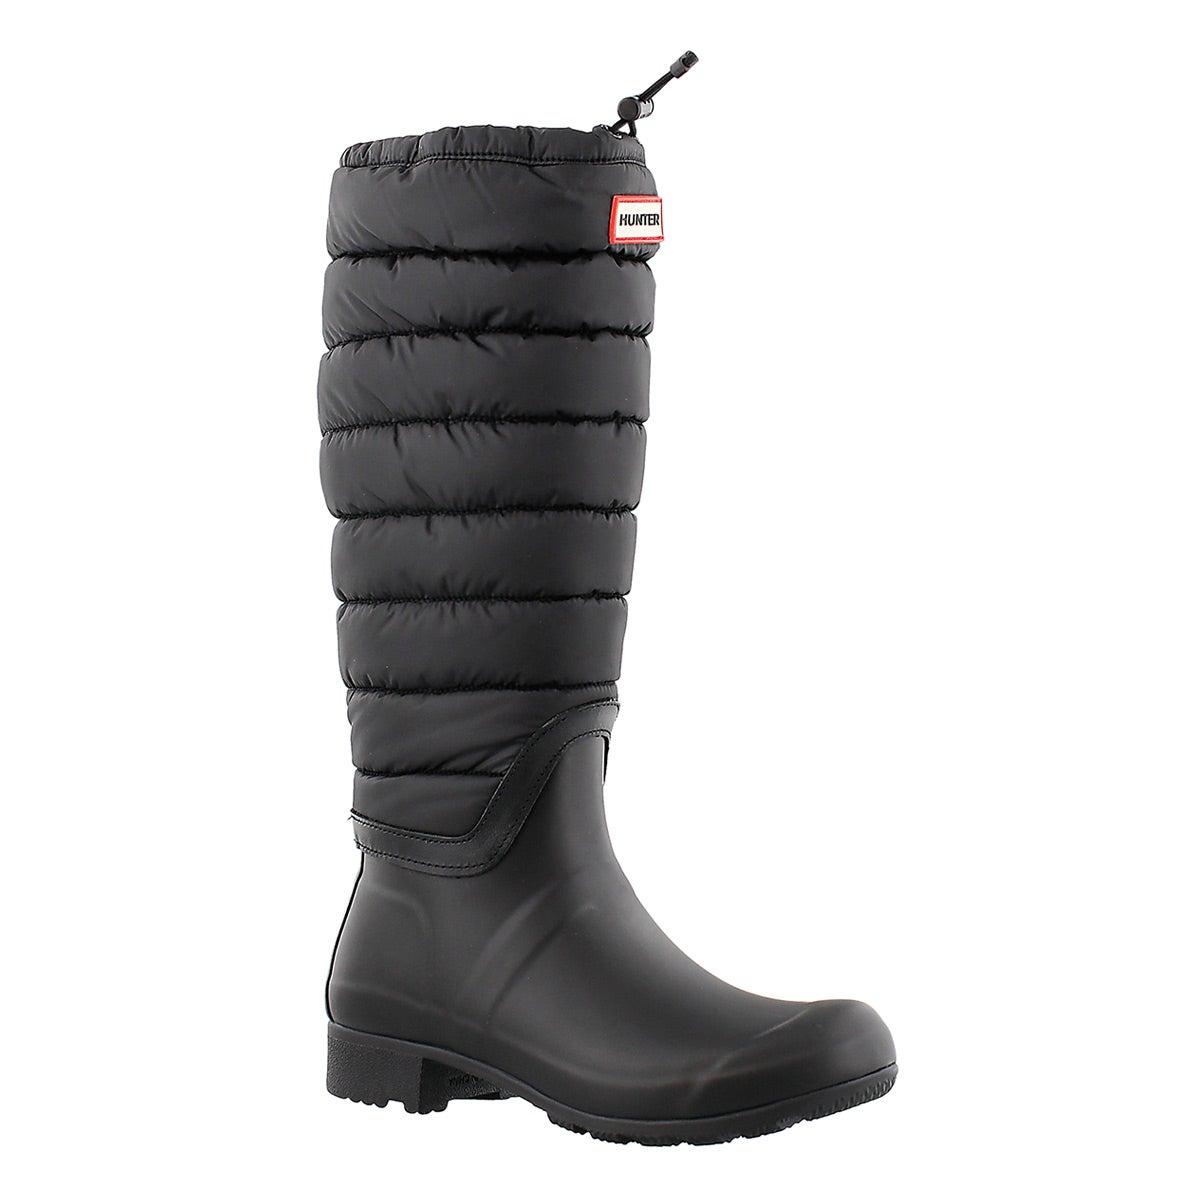 Lds Original Quilted Leg black rain boot